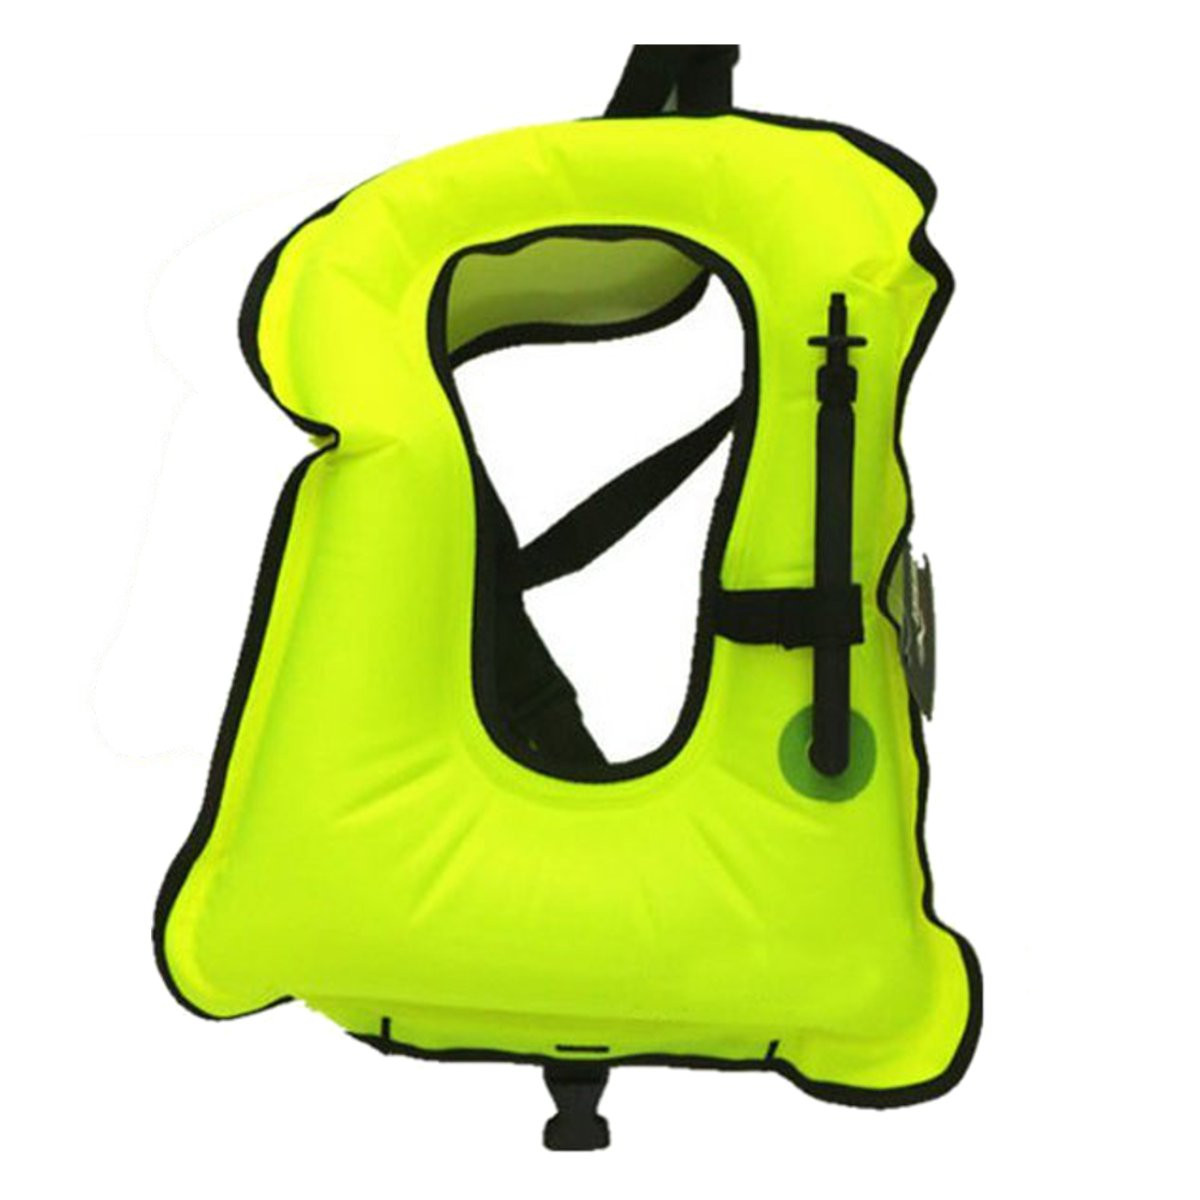 ФОТО Free shipping Inflatable life jacket Super light Buoyancy vest Float ring swim Snorkeling dive suit Equipment swim Adult Kids